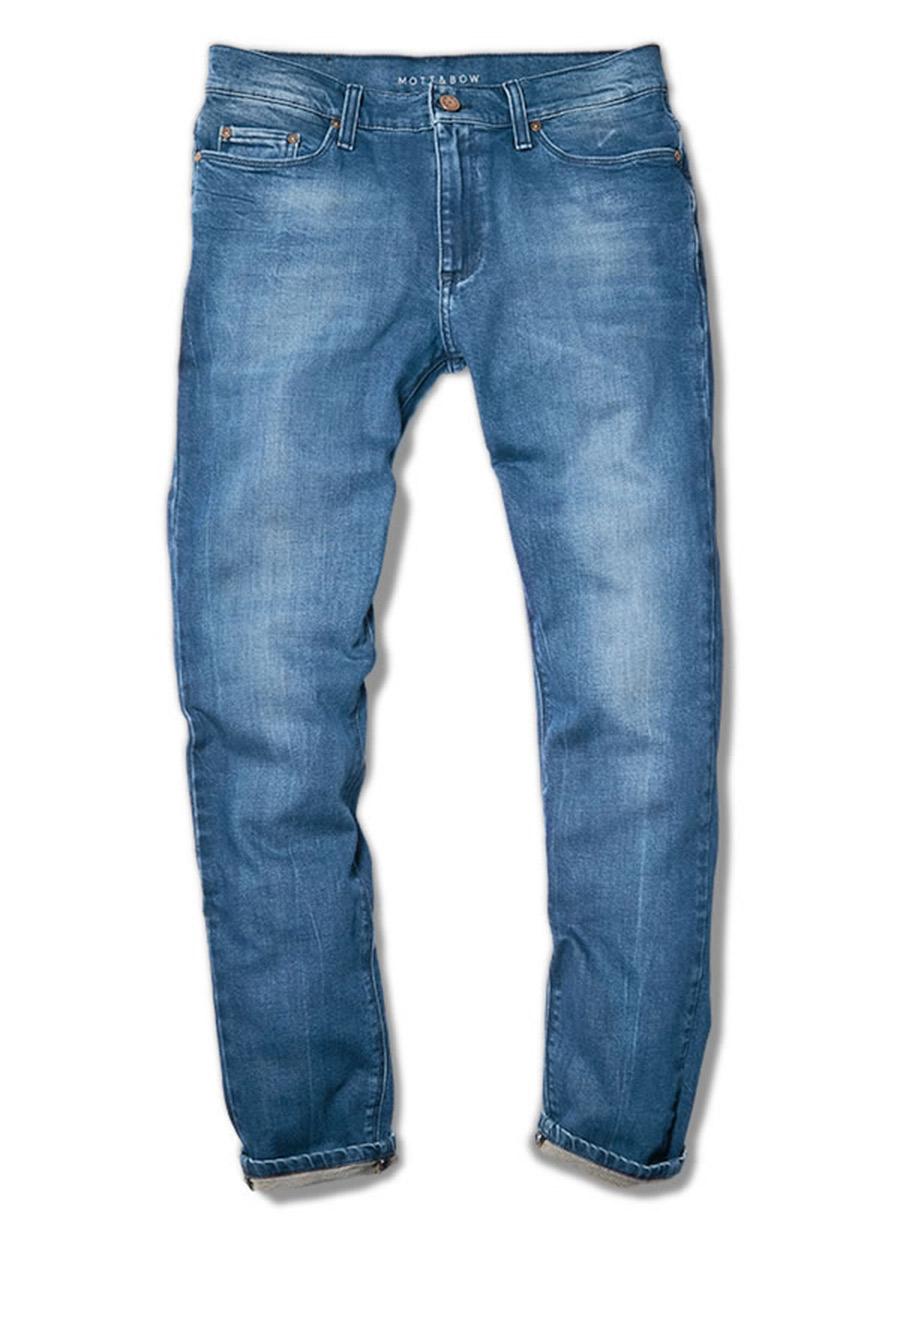 Mott and Bow Slim Ludlow Denim Jeans